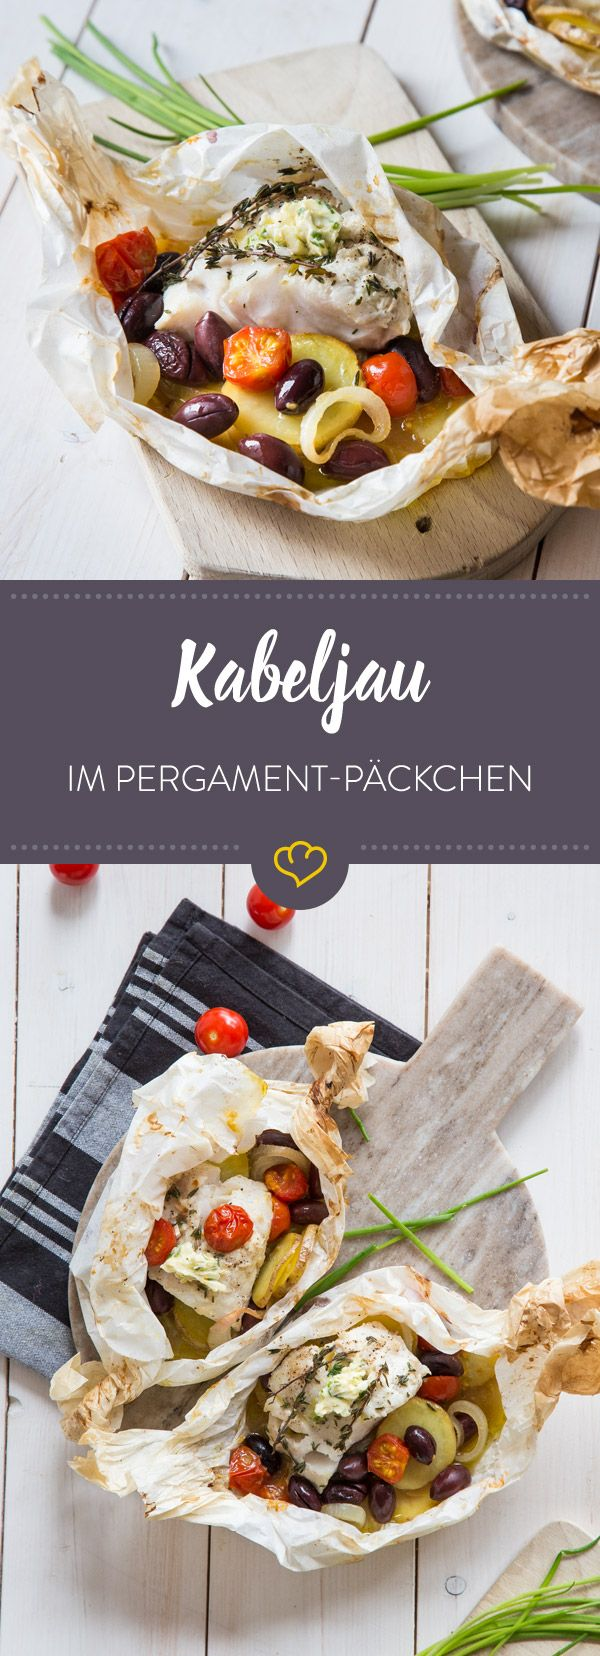 Best 25 feast of tabernacles ideas on pinterest jewish for Jewish fish dish